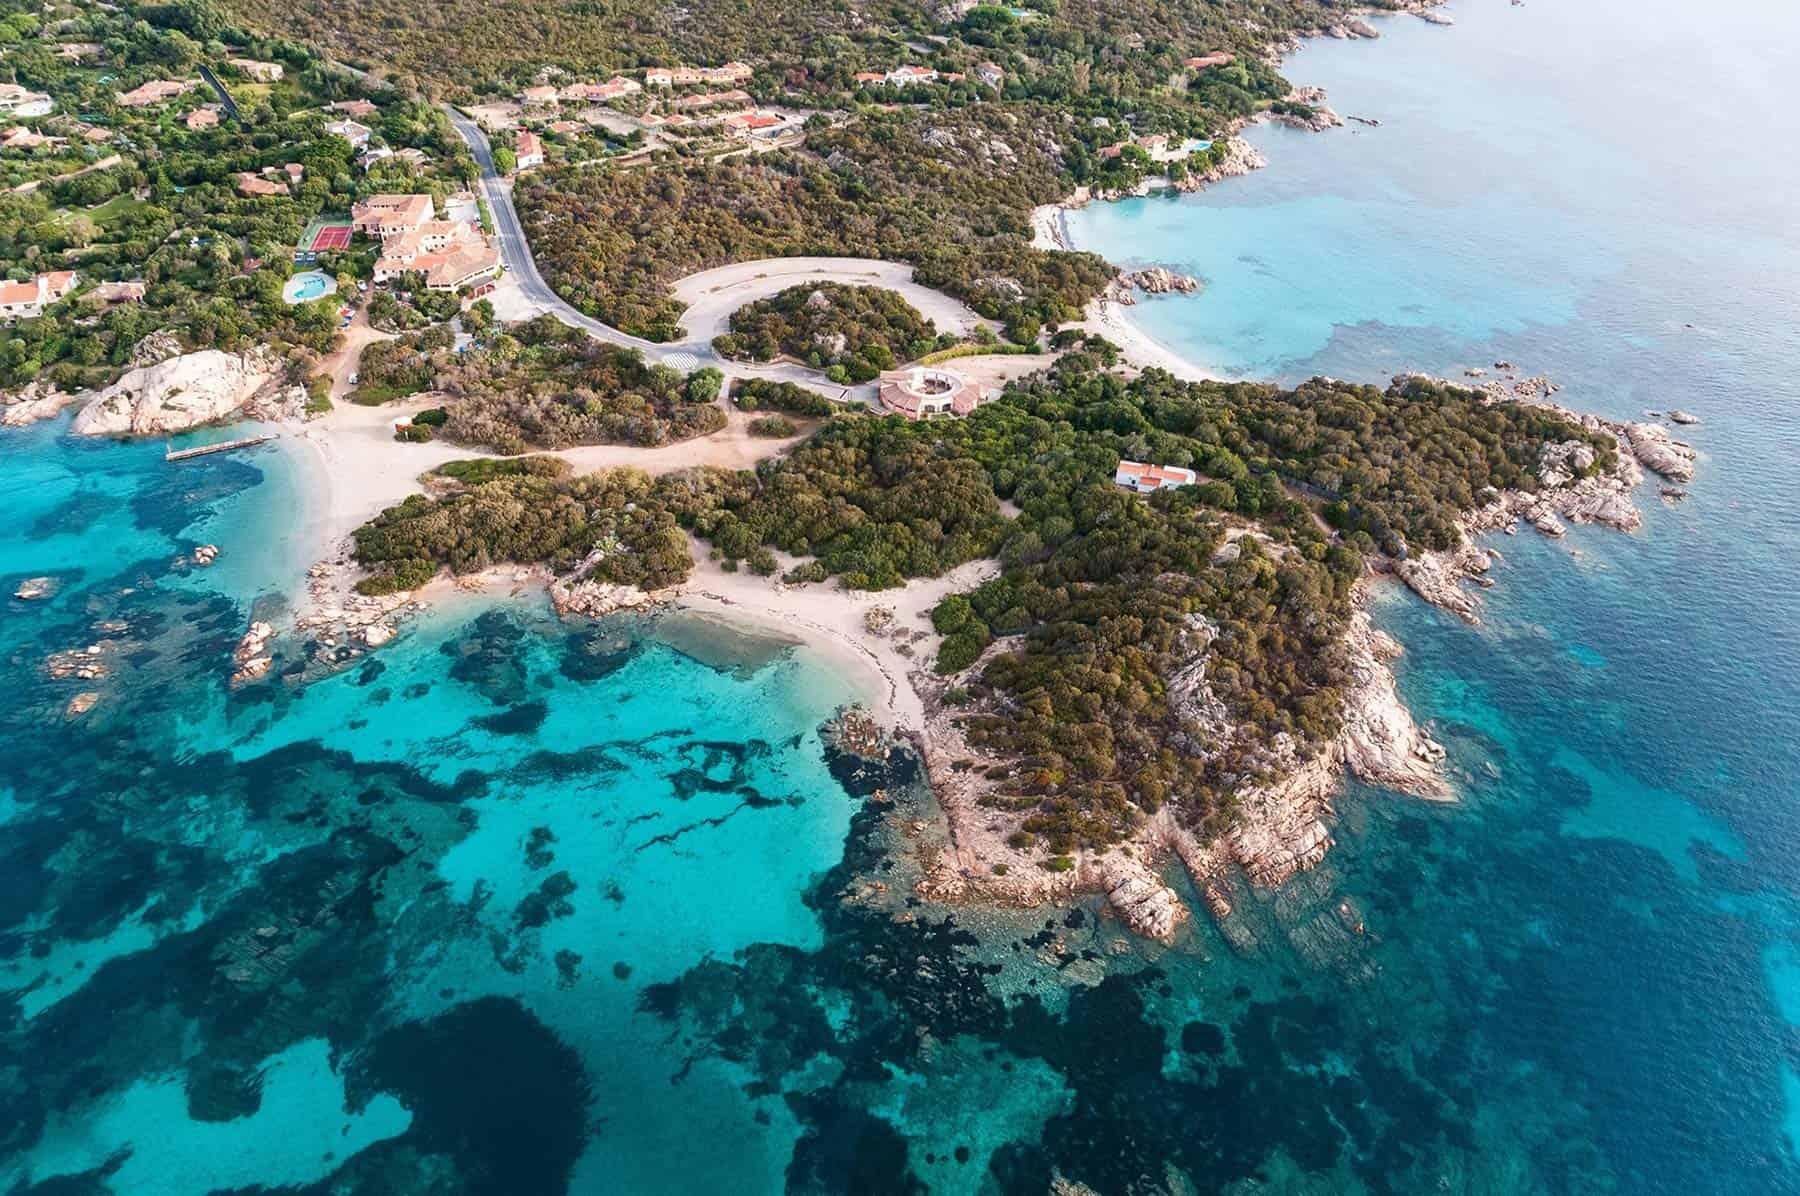 Costa Smeralda beaches